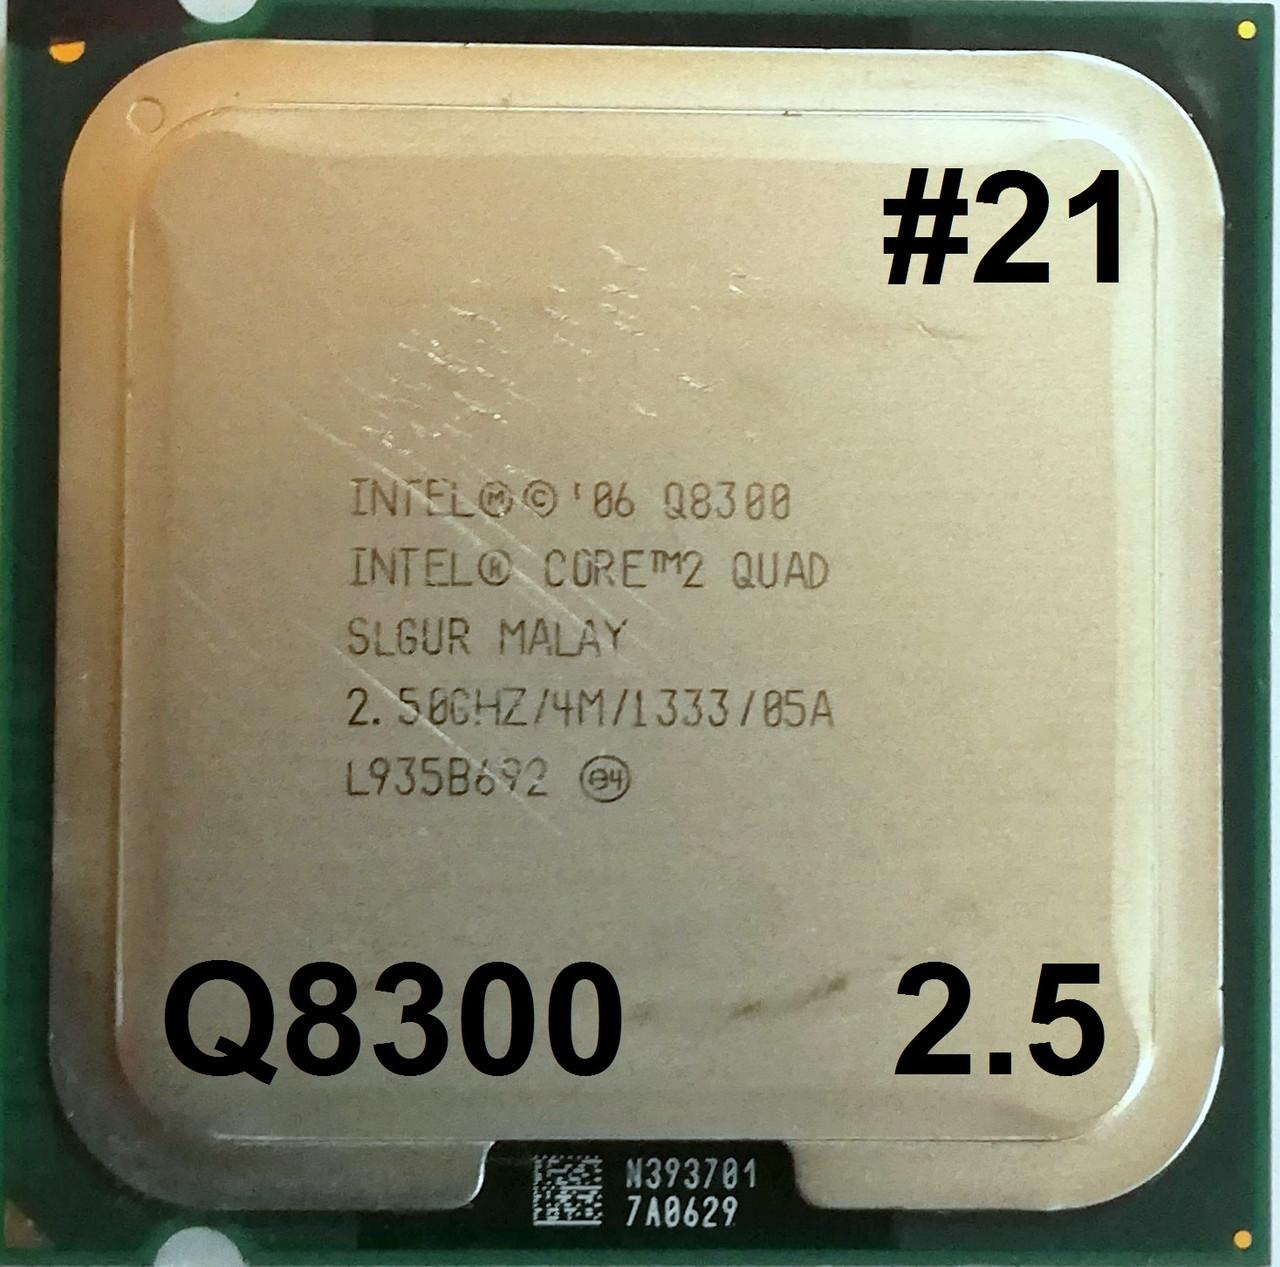 Процессор ЛОТ#21 Intel Core 2 Quad Q8300 R0 SLGUR 2.5GHz 4M Cache 1333 MHz FSB Socket 775 Б/У